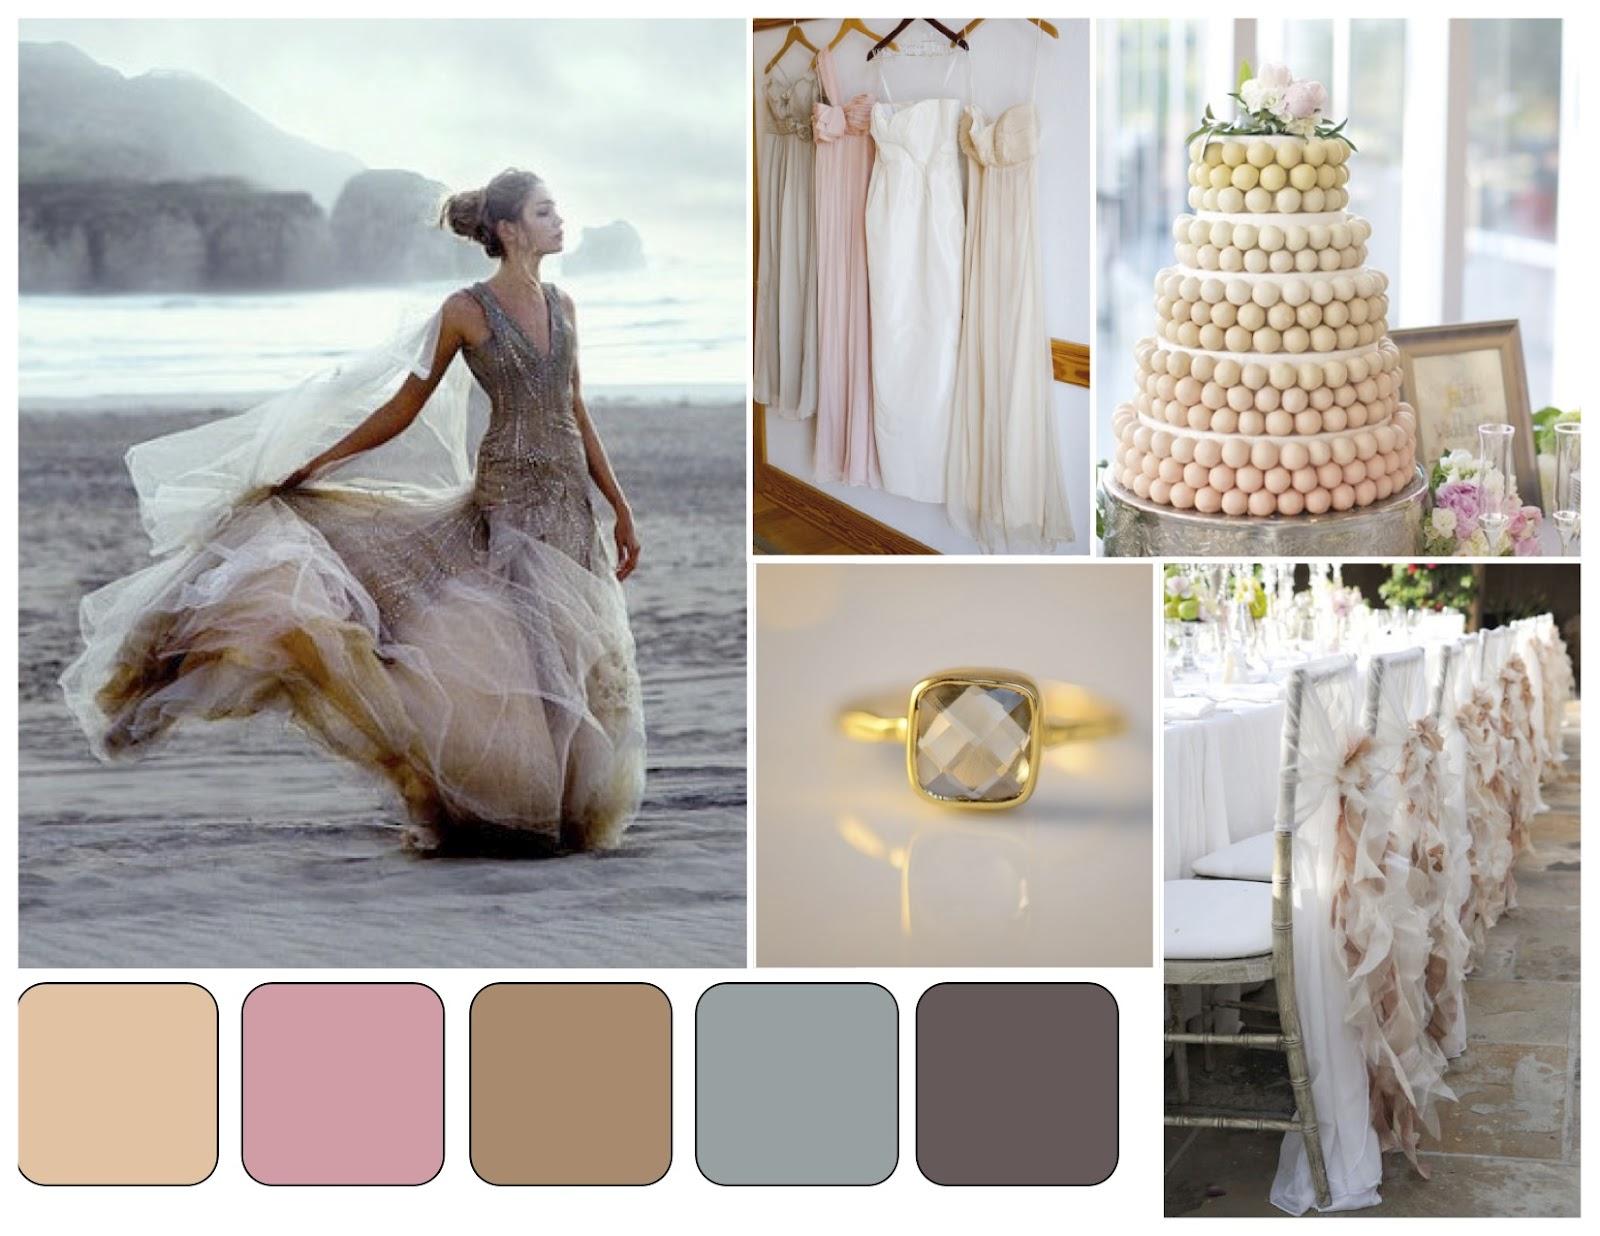 champagne ombre wedding dress ombre wedding dress champagne ombre wedding dress champagne ombre wedding dress